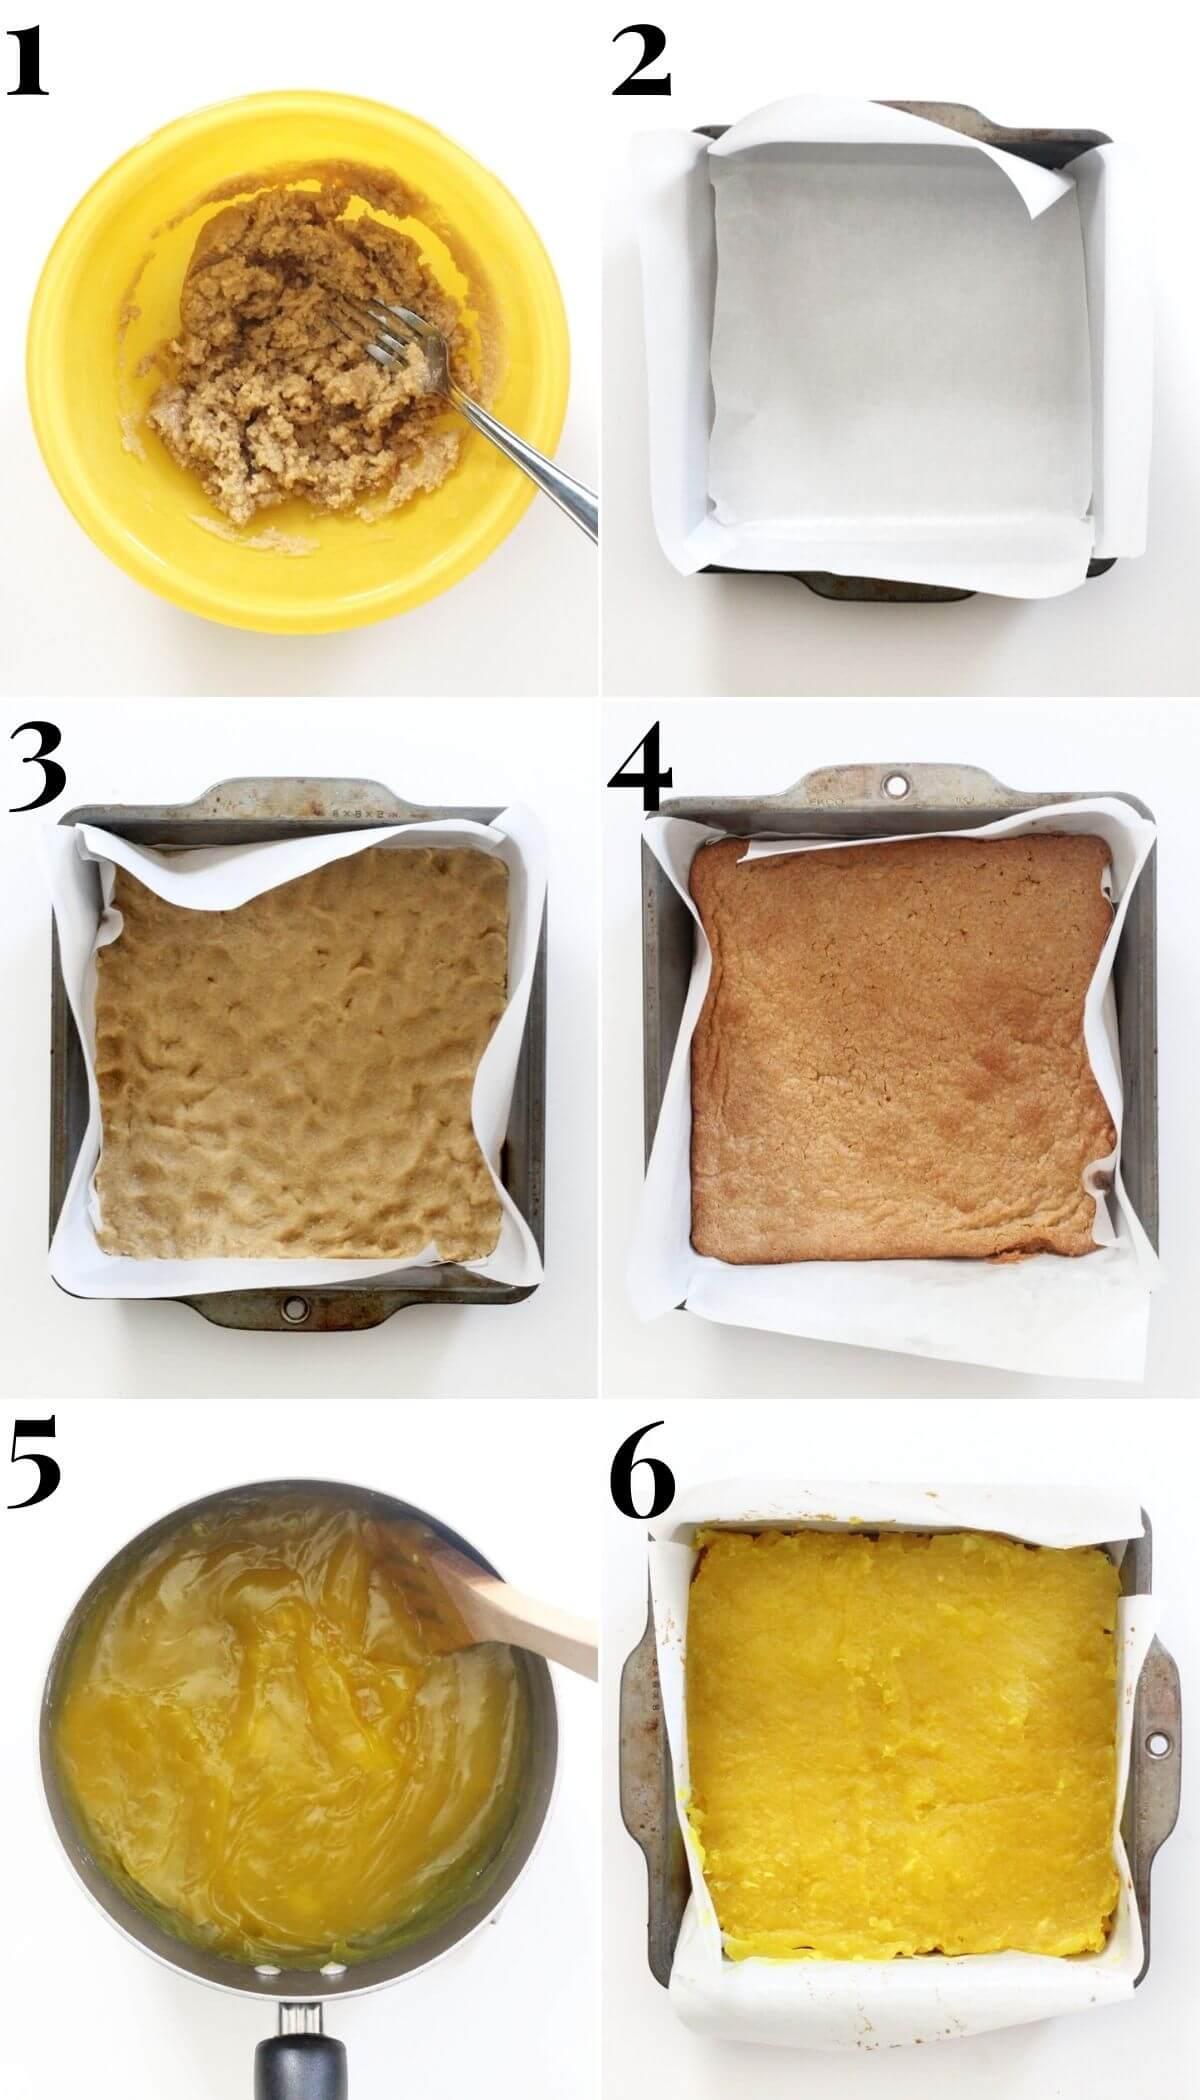 6 step process for making gluten-free and vegan lemon bars